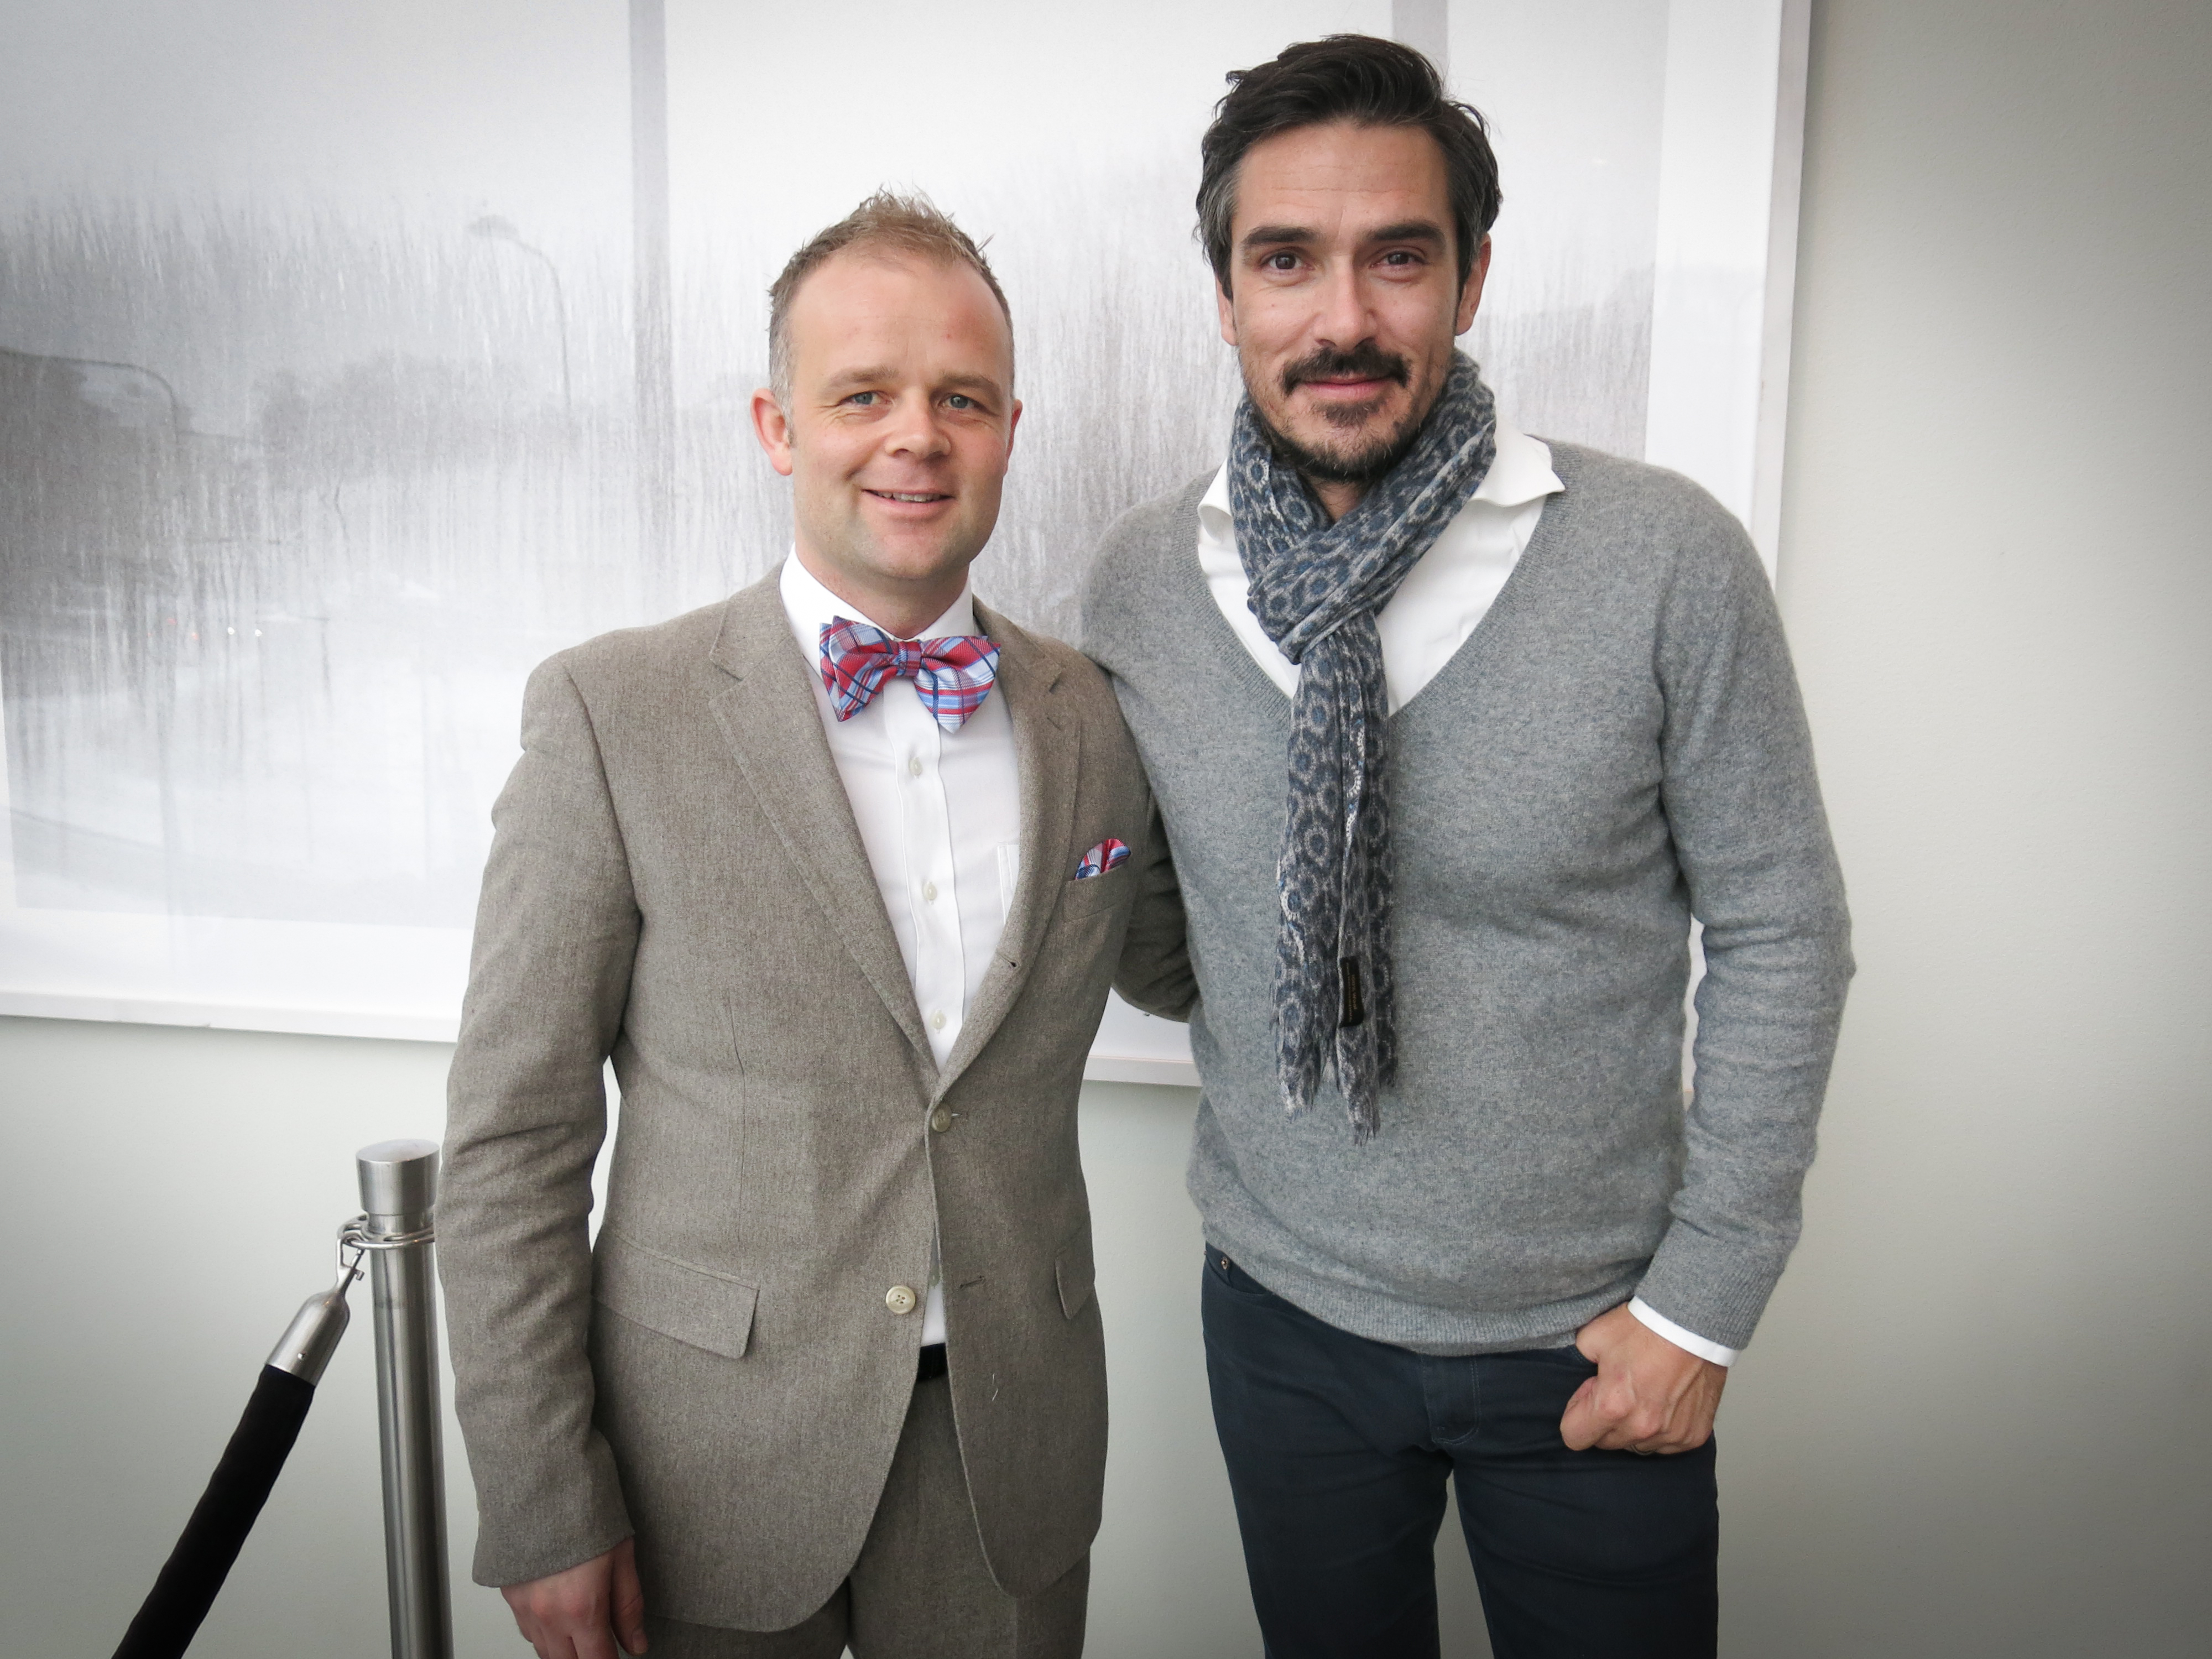 Geir Håvard Kvalheim och Läkaren Miguel